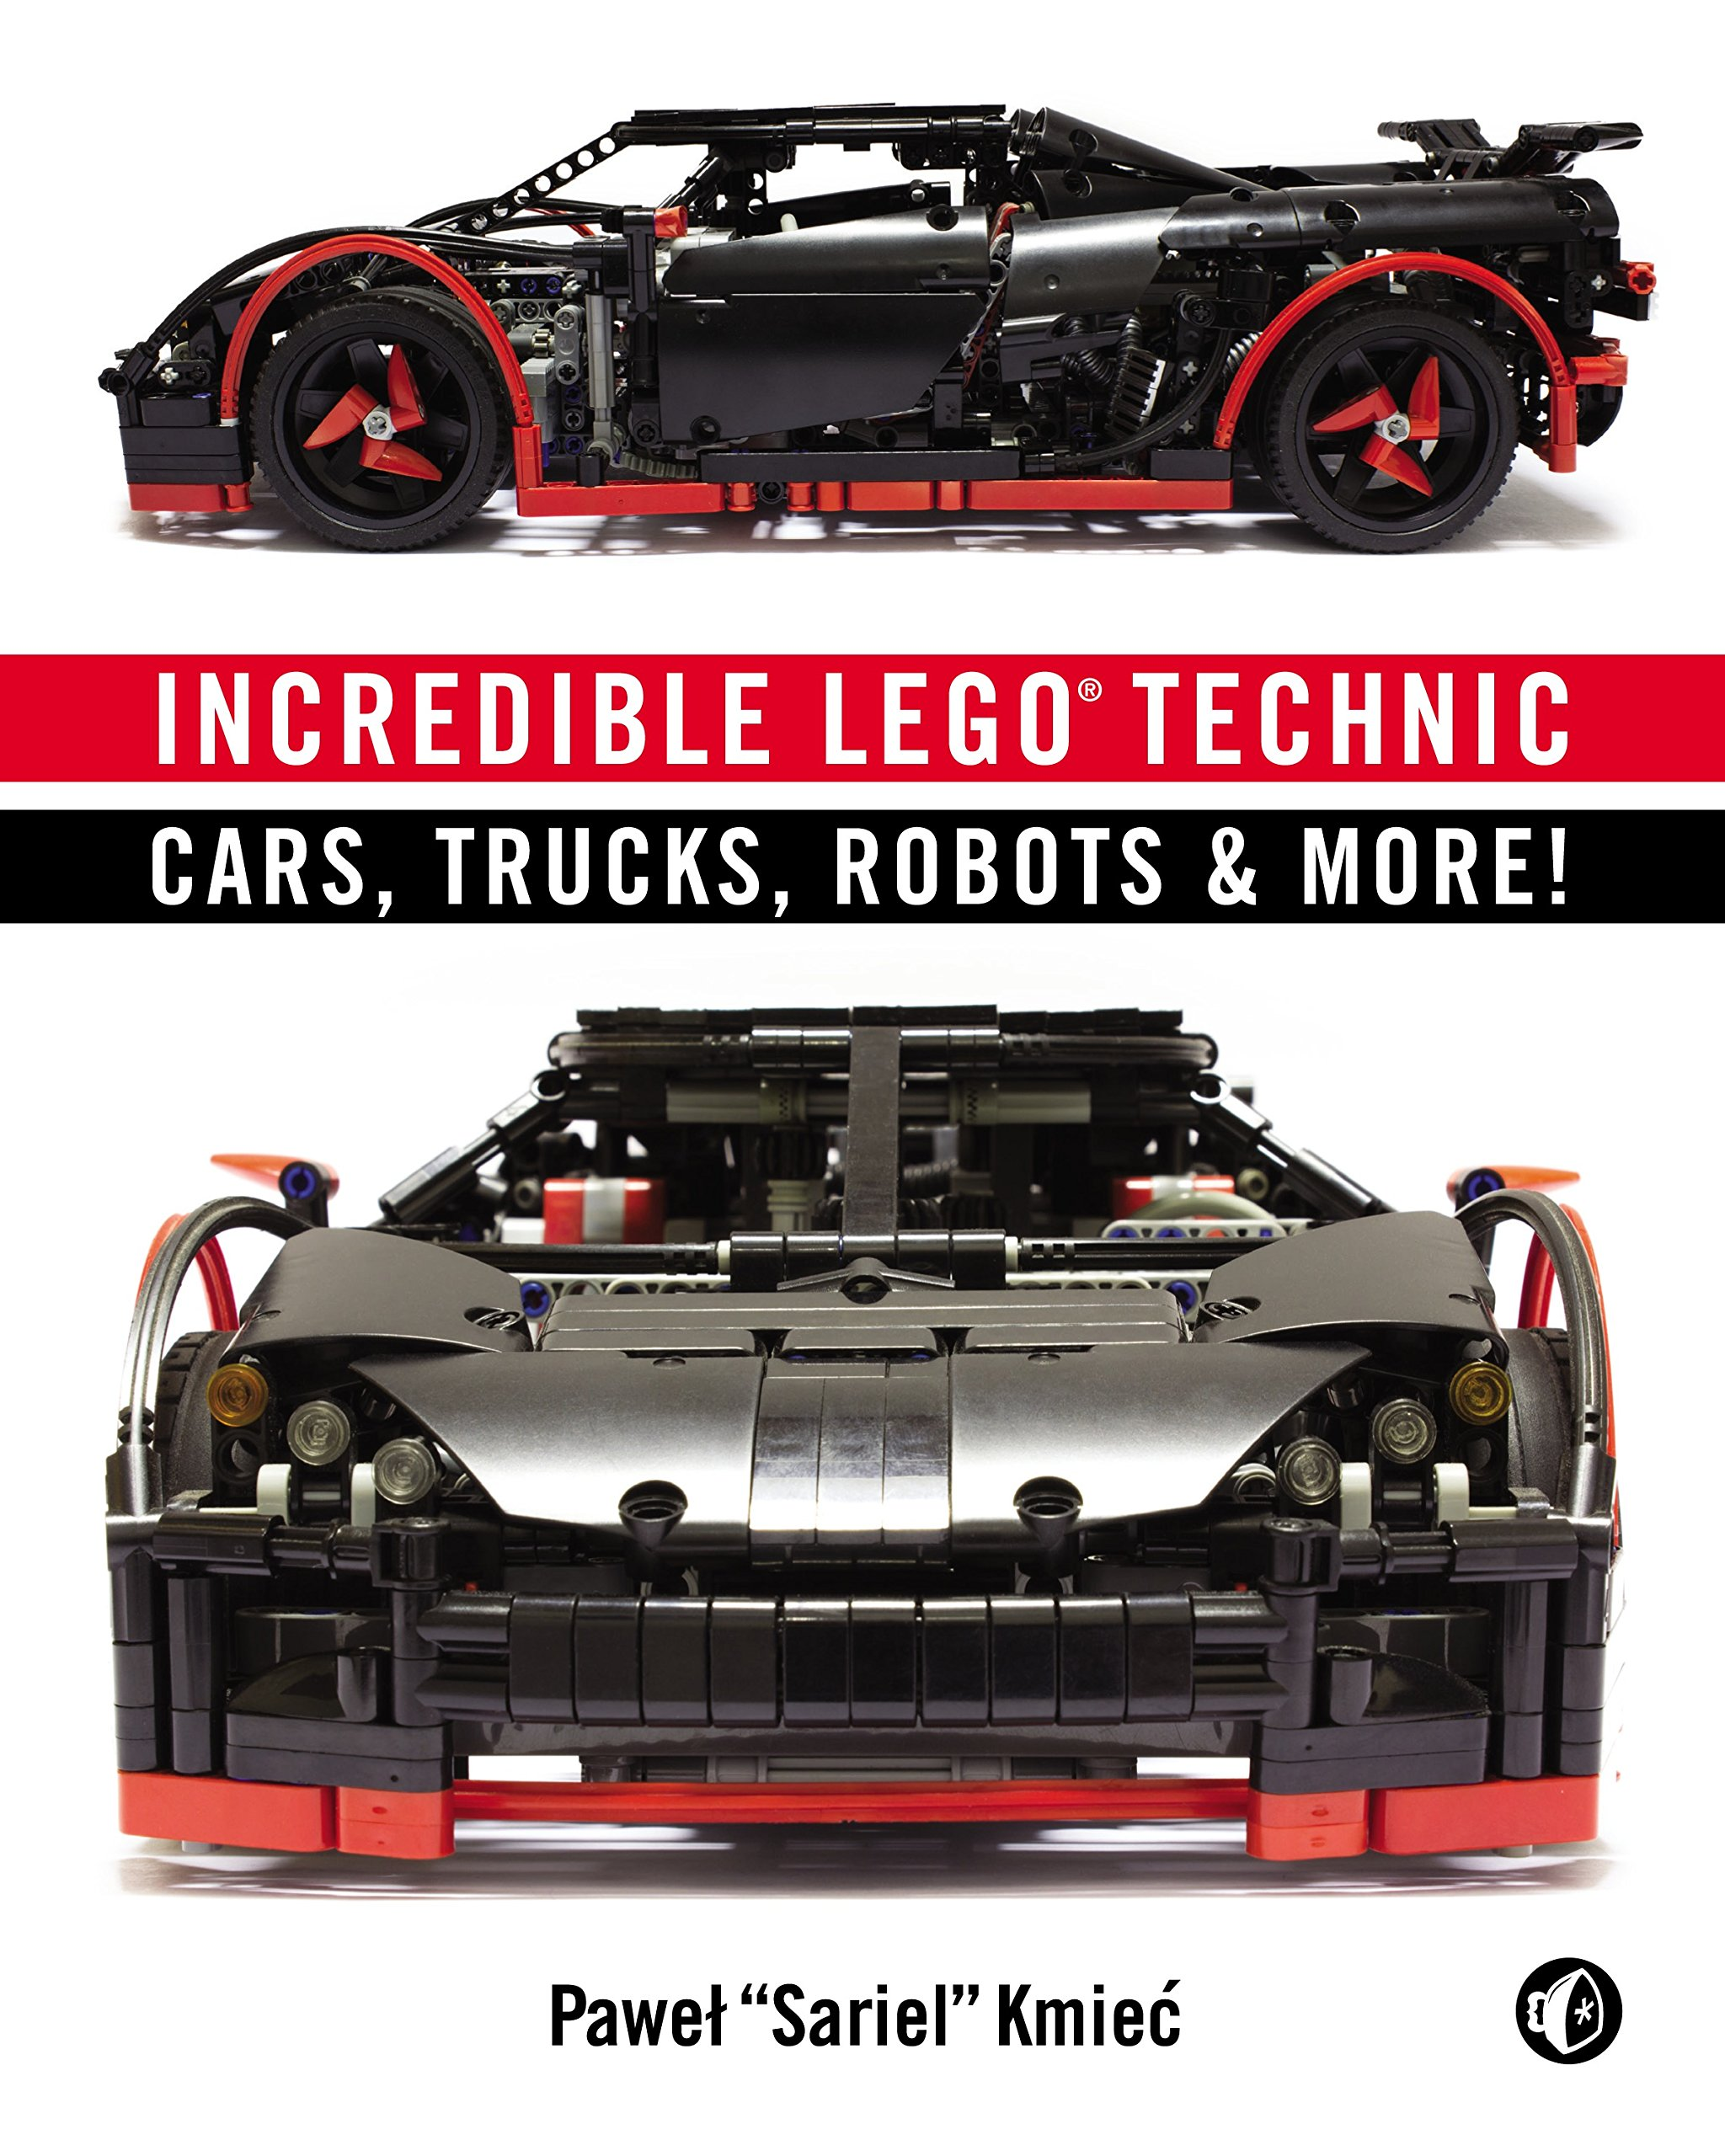 Incredible LEGO Technic: Cars Trucks Robots & More! (English Edition)